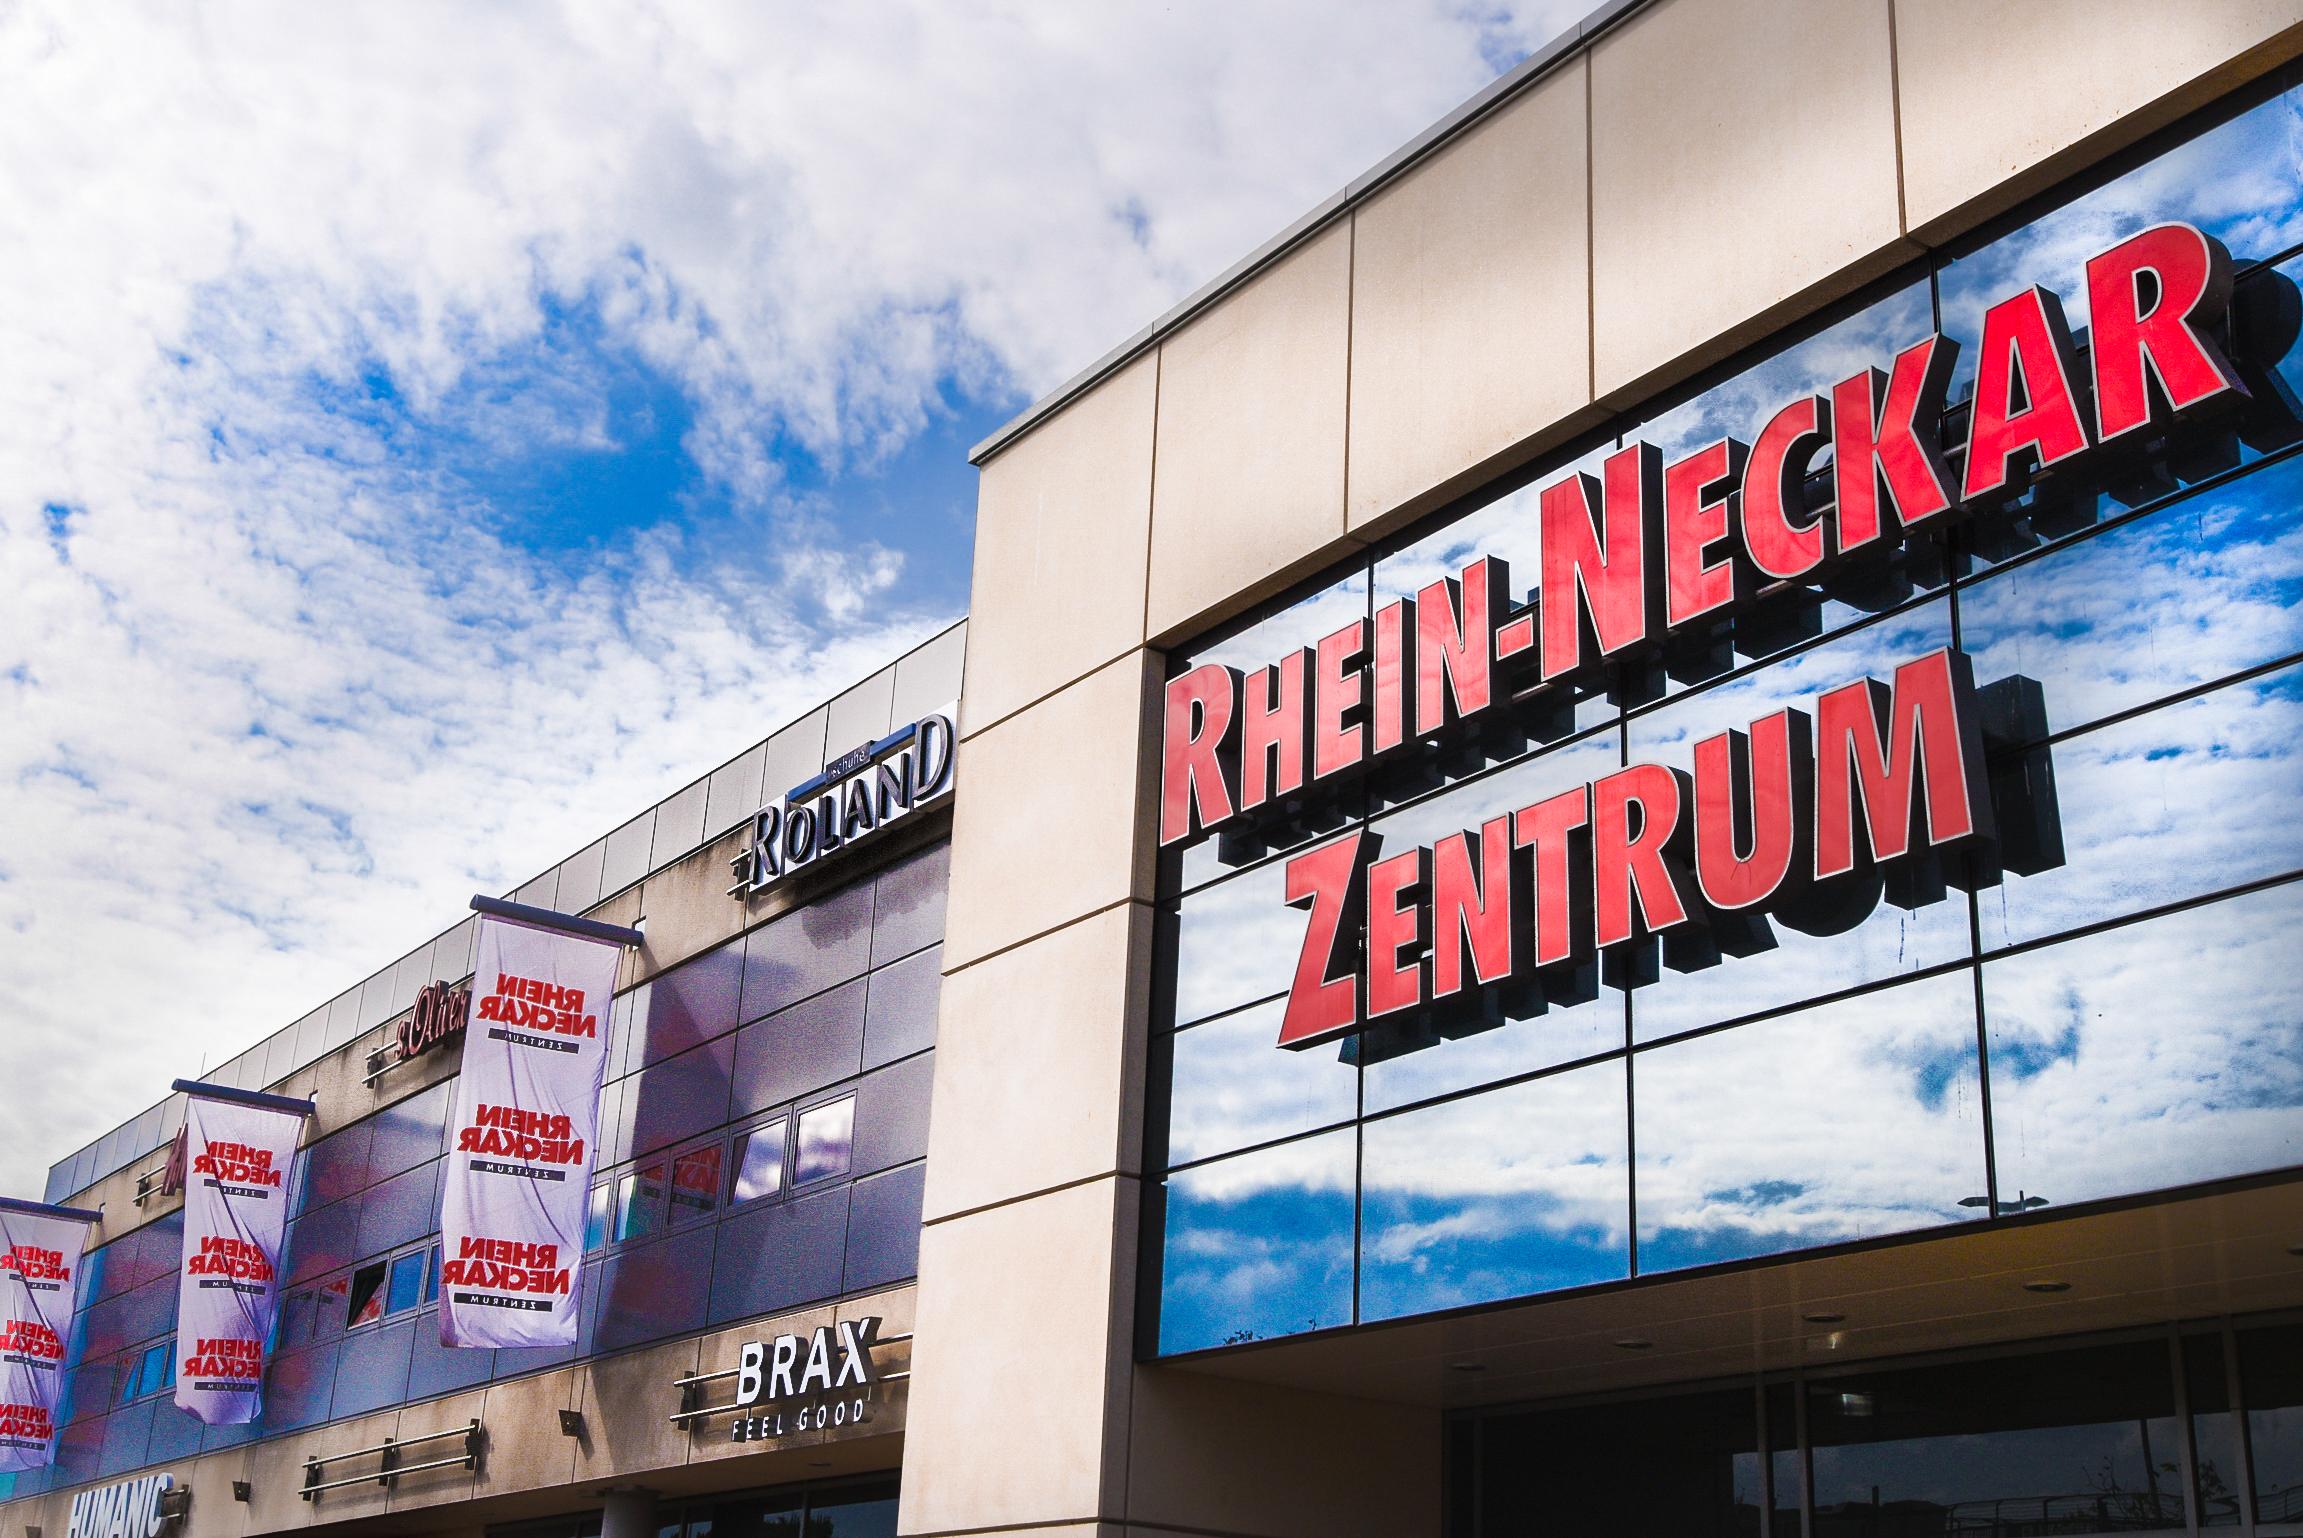 Rhein-Neckar-Zentrum